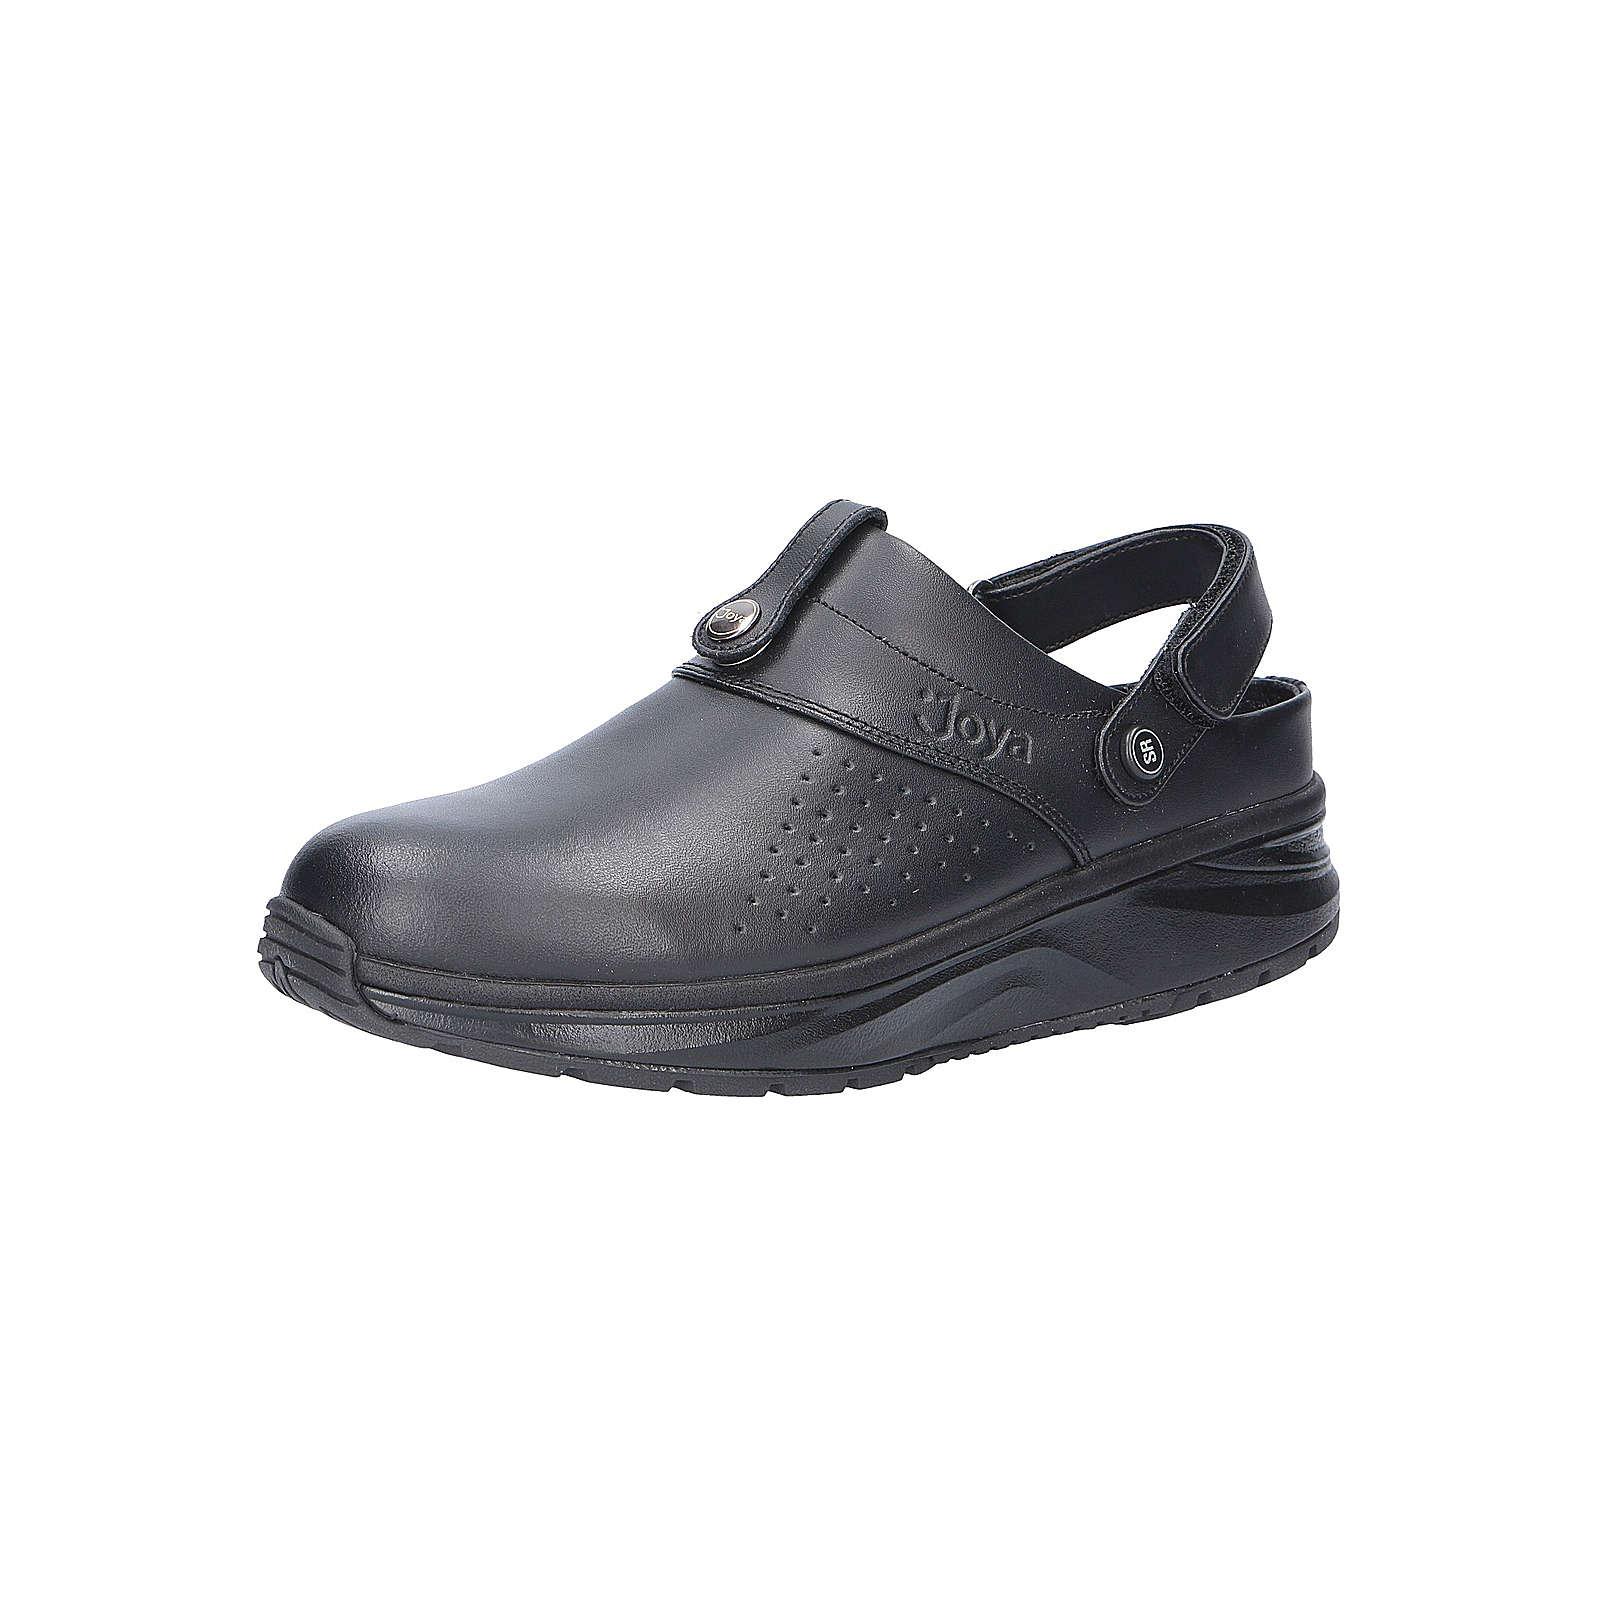 Joya Comfort Pantolette IQ SR BLACK W Clogs schwarz Damen Gr. 36 1/3